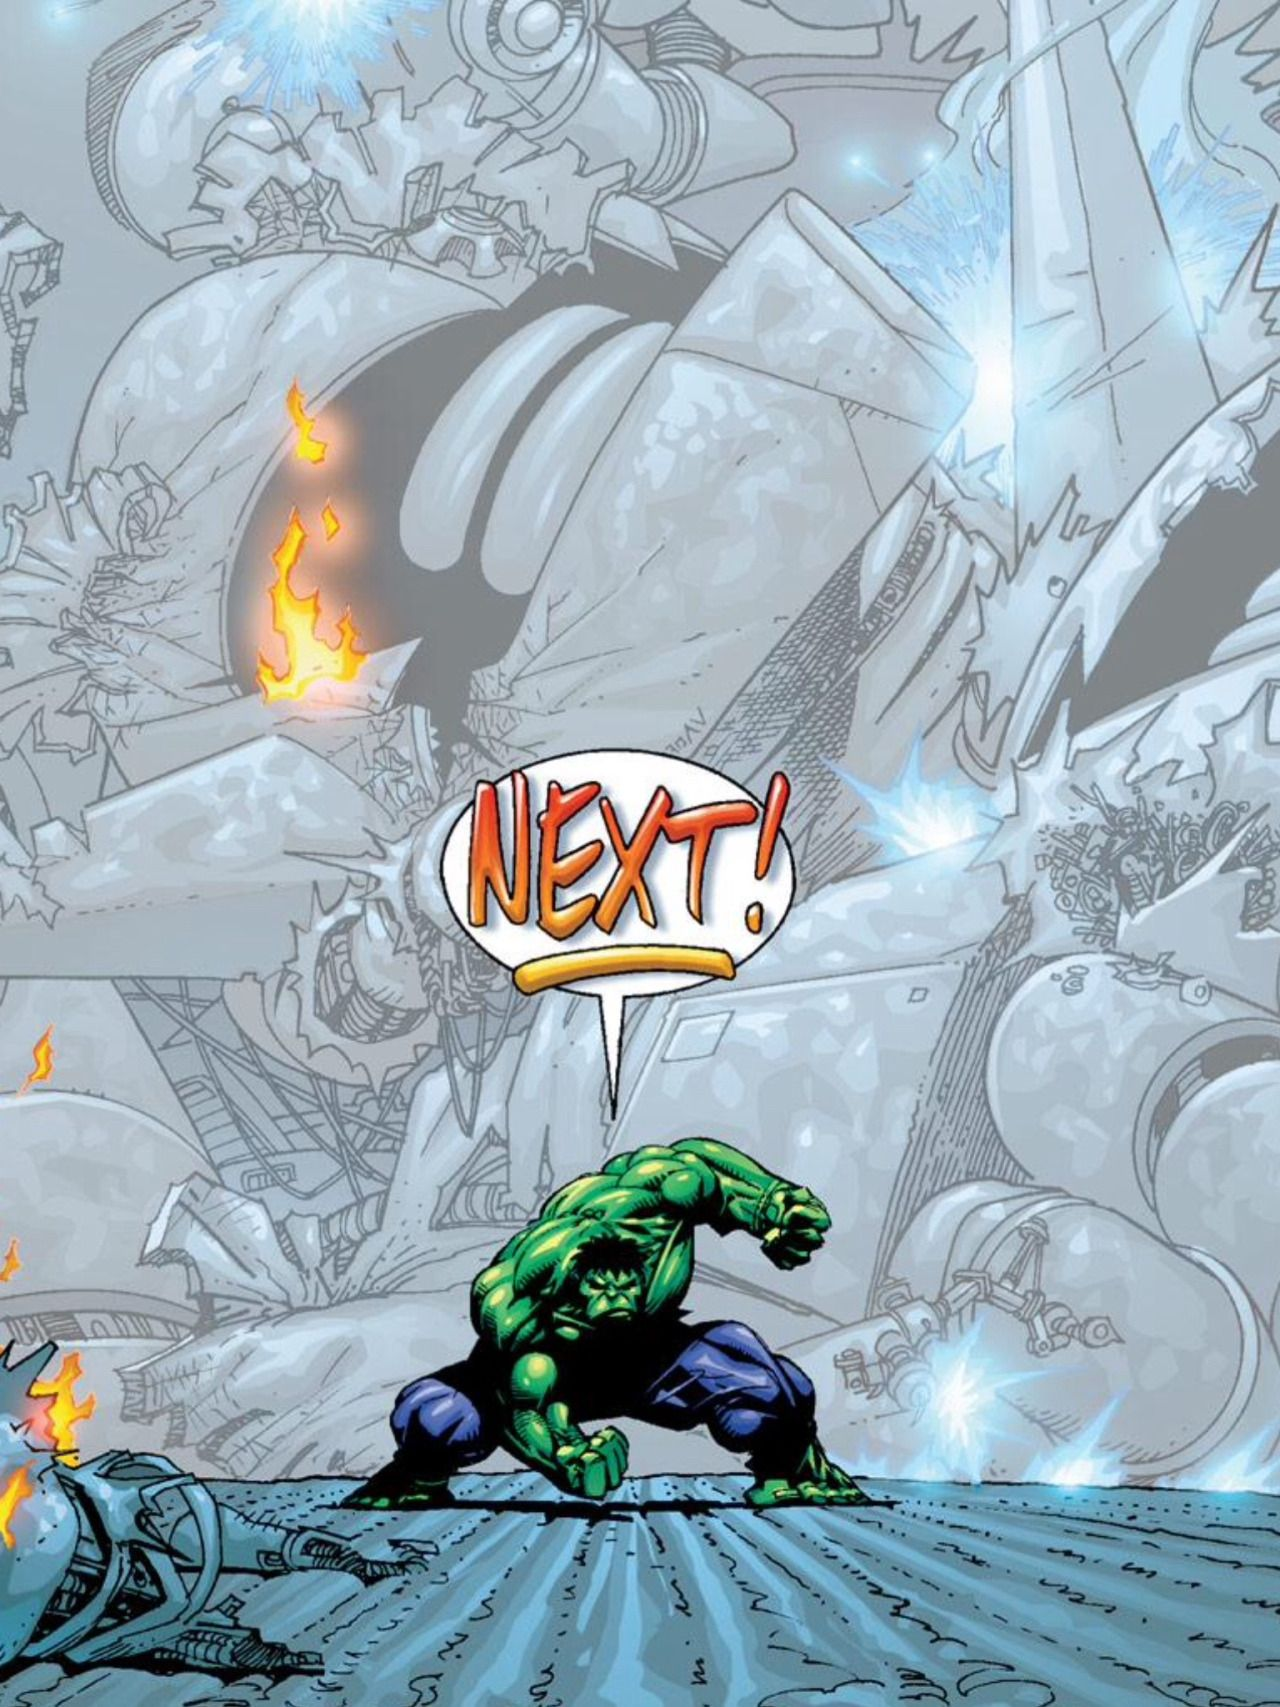 #Hulk #Fan #Art. (The Incredible Hulk #463 Cover) By: Adam Kubert. (THE * 5 * STÅR * ÅWARD * OF: * AW YEAH, IT'S MAJOR ÅWESOMENESS!!!™)[THANK Ü 4 PINNING!!!<·><]<©>ÅÅÅ+(OB4E)